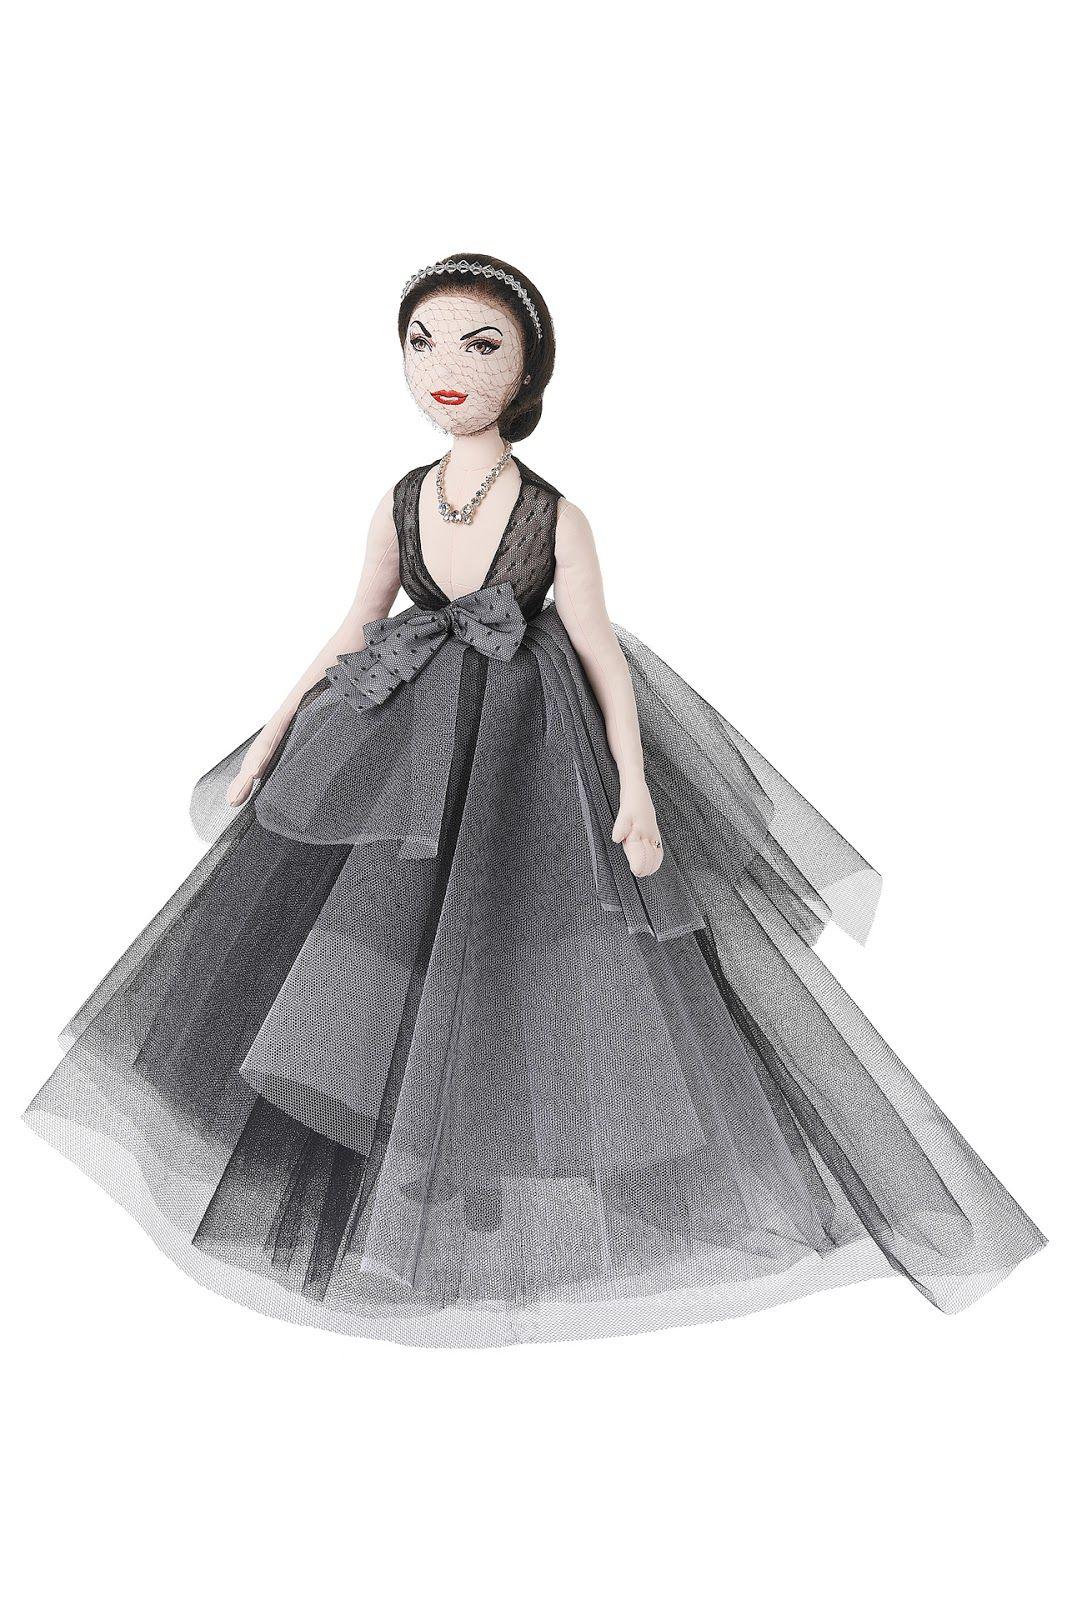 Cool Girls Closet: Dior Decorates Printemps Windows For The Holidays